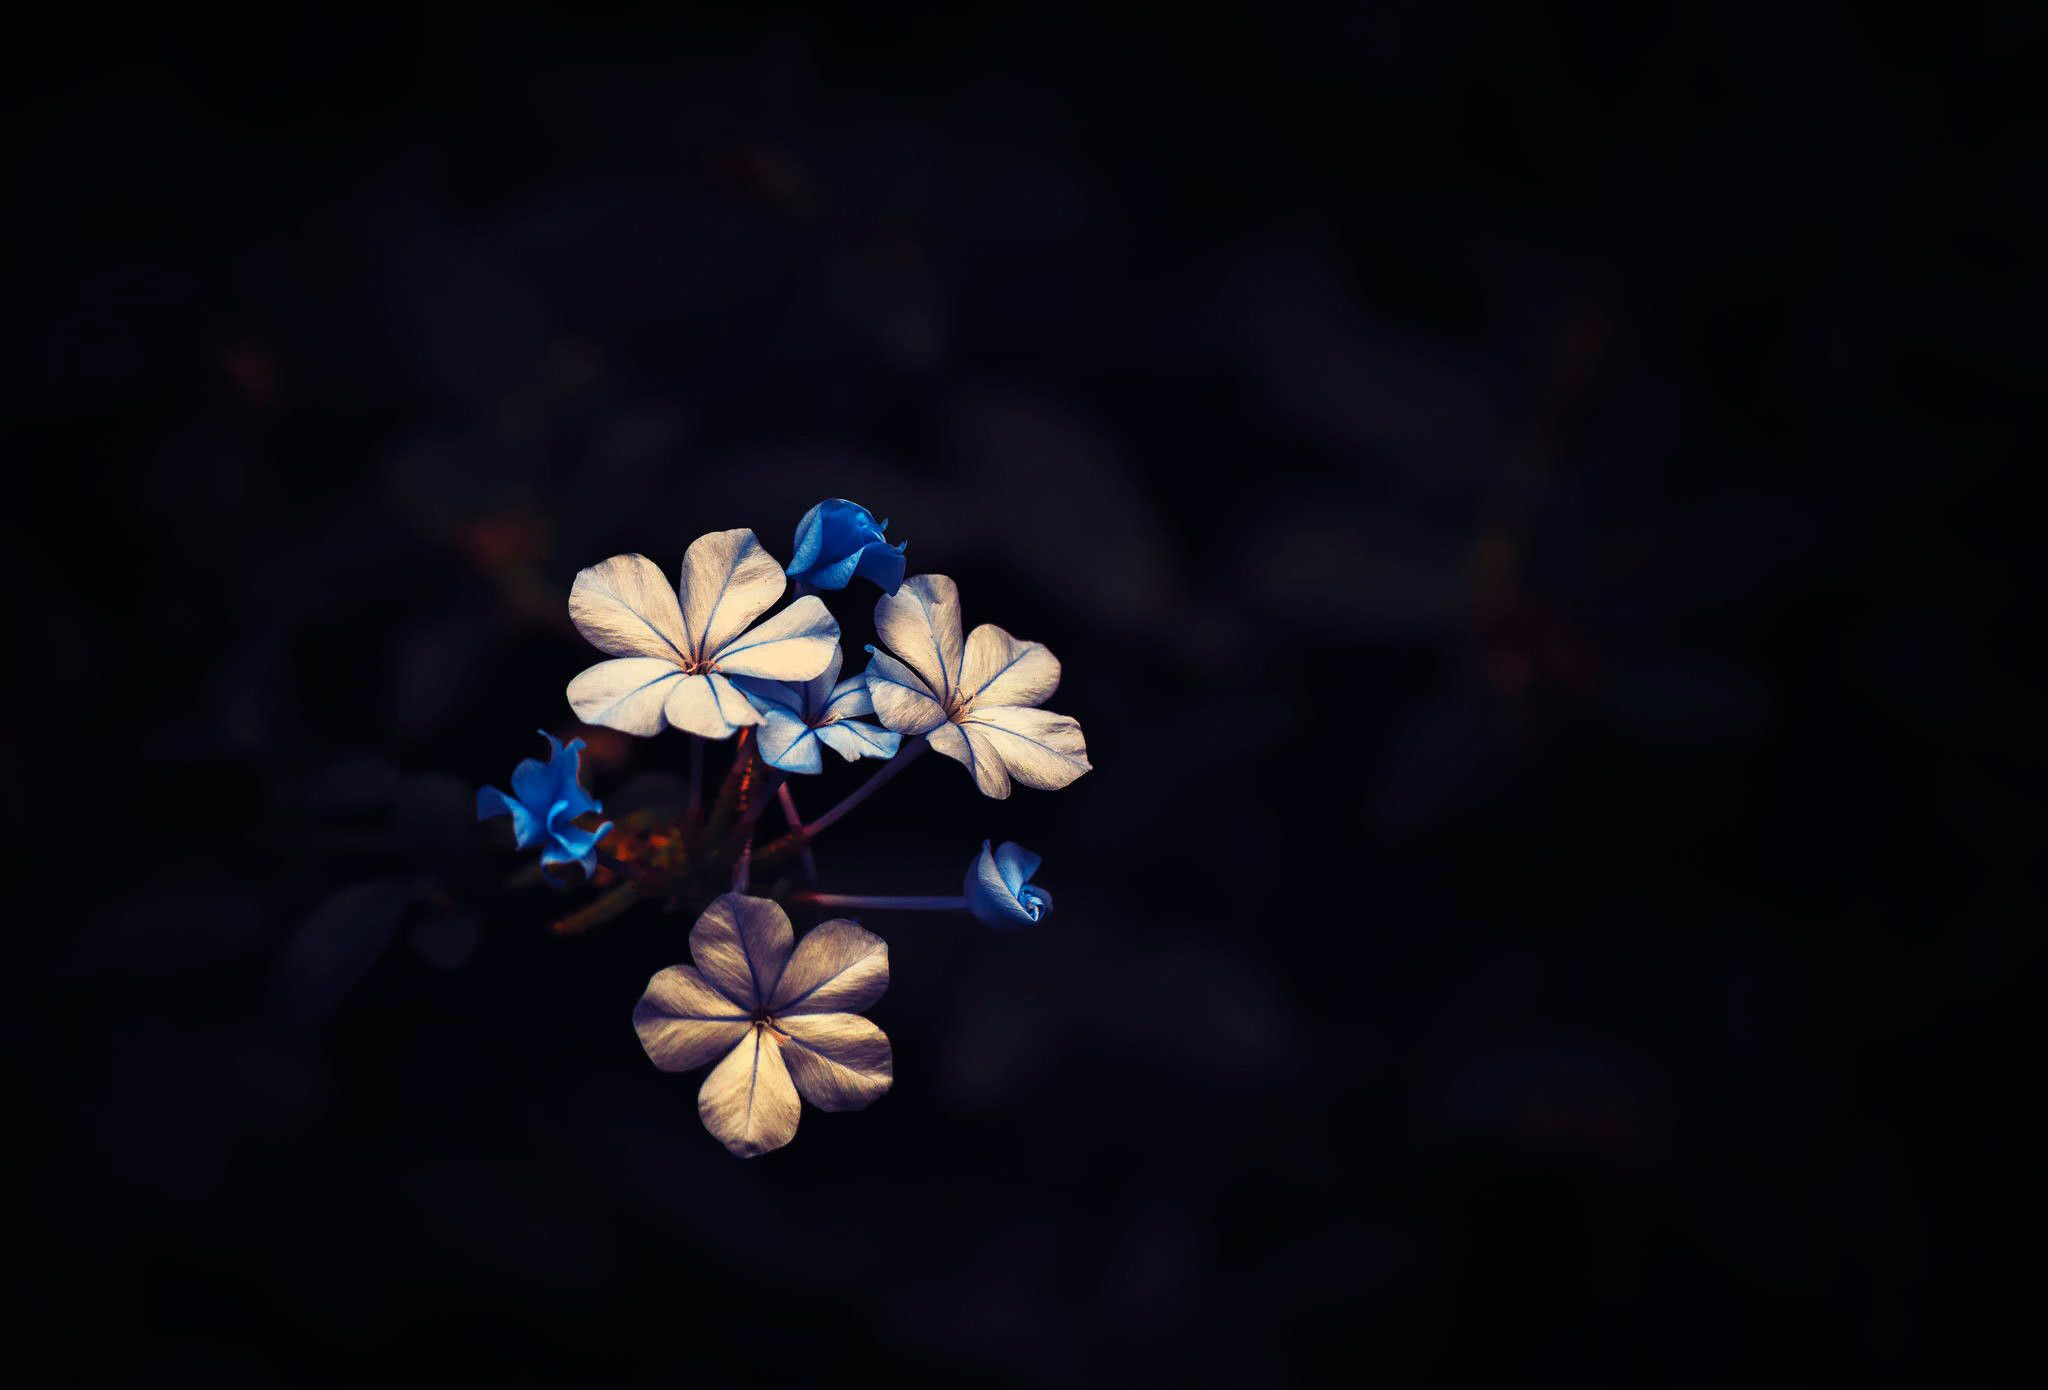 Dark Hd Flowers Wallpapers Top Free Dark Hd Flowers Backgrounds